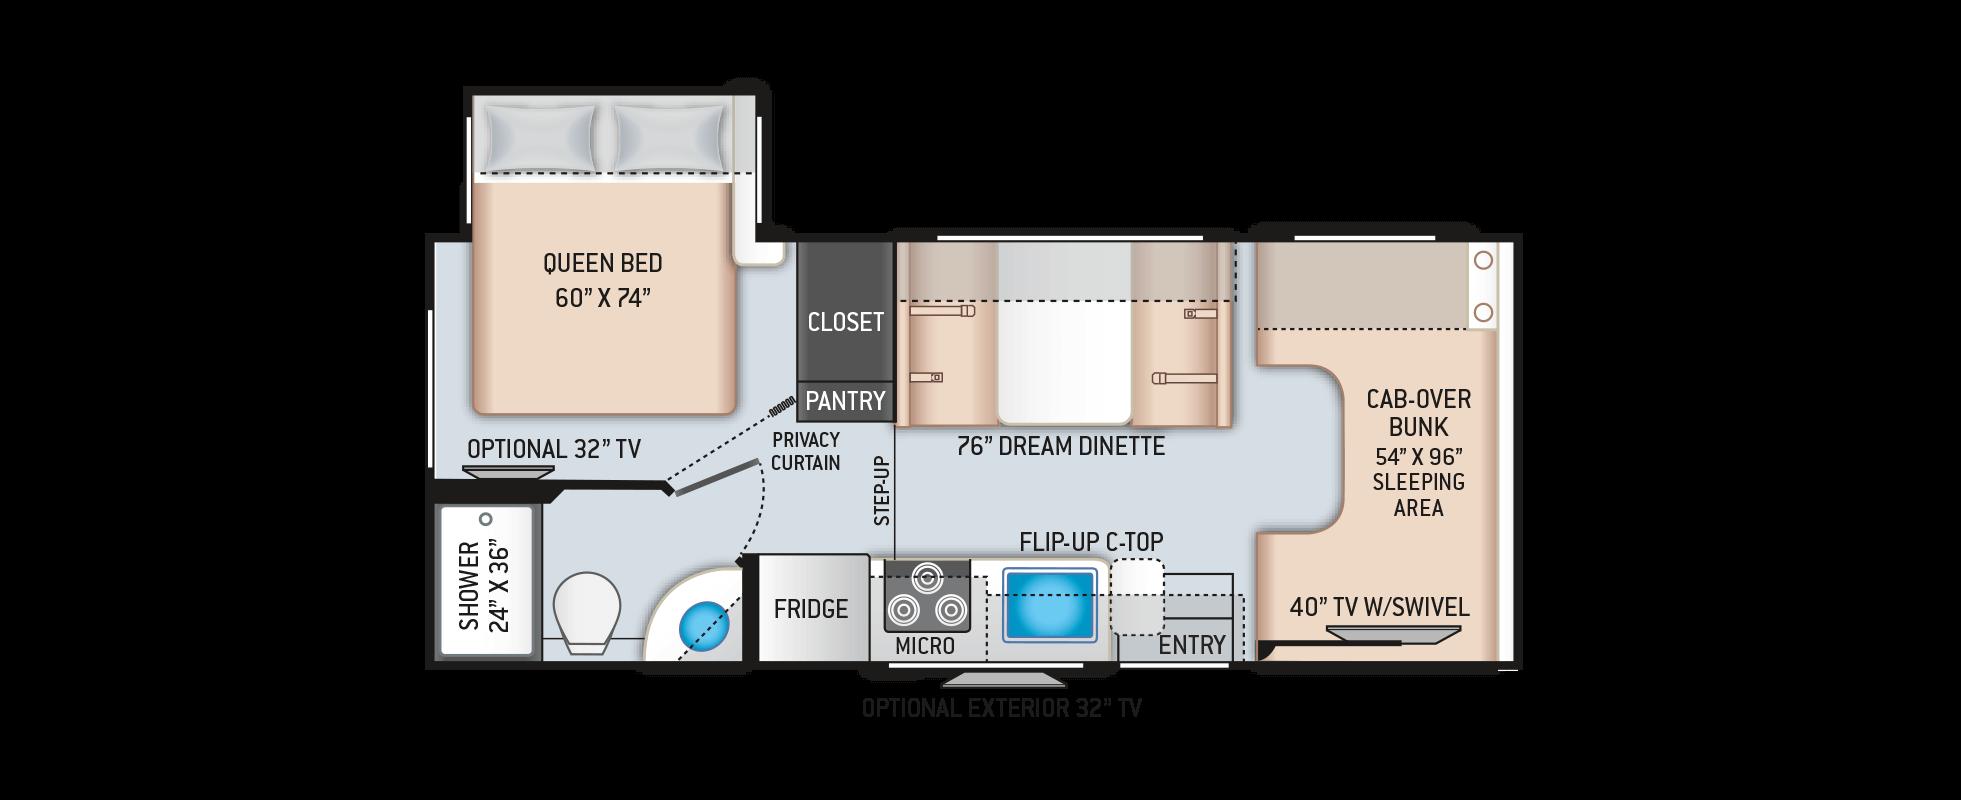 Ford X Plan Pricing >> Chateau Class C Motorhomes - Floor Plan: 22B | Thor Motor ...